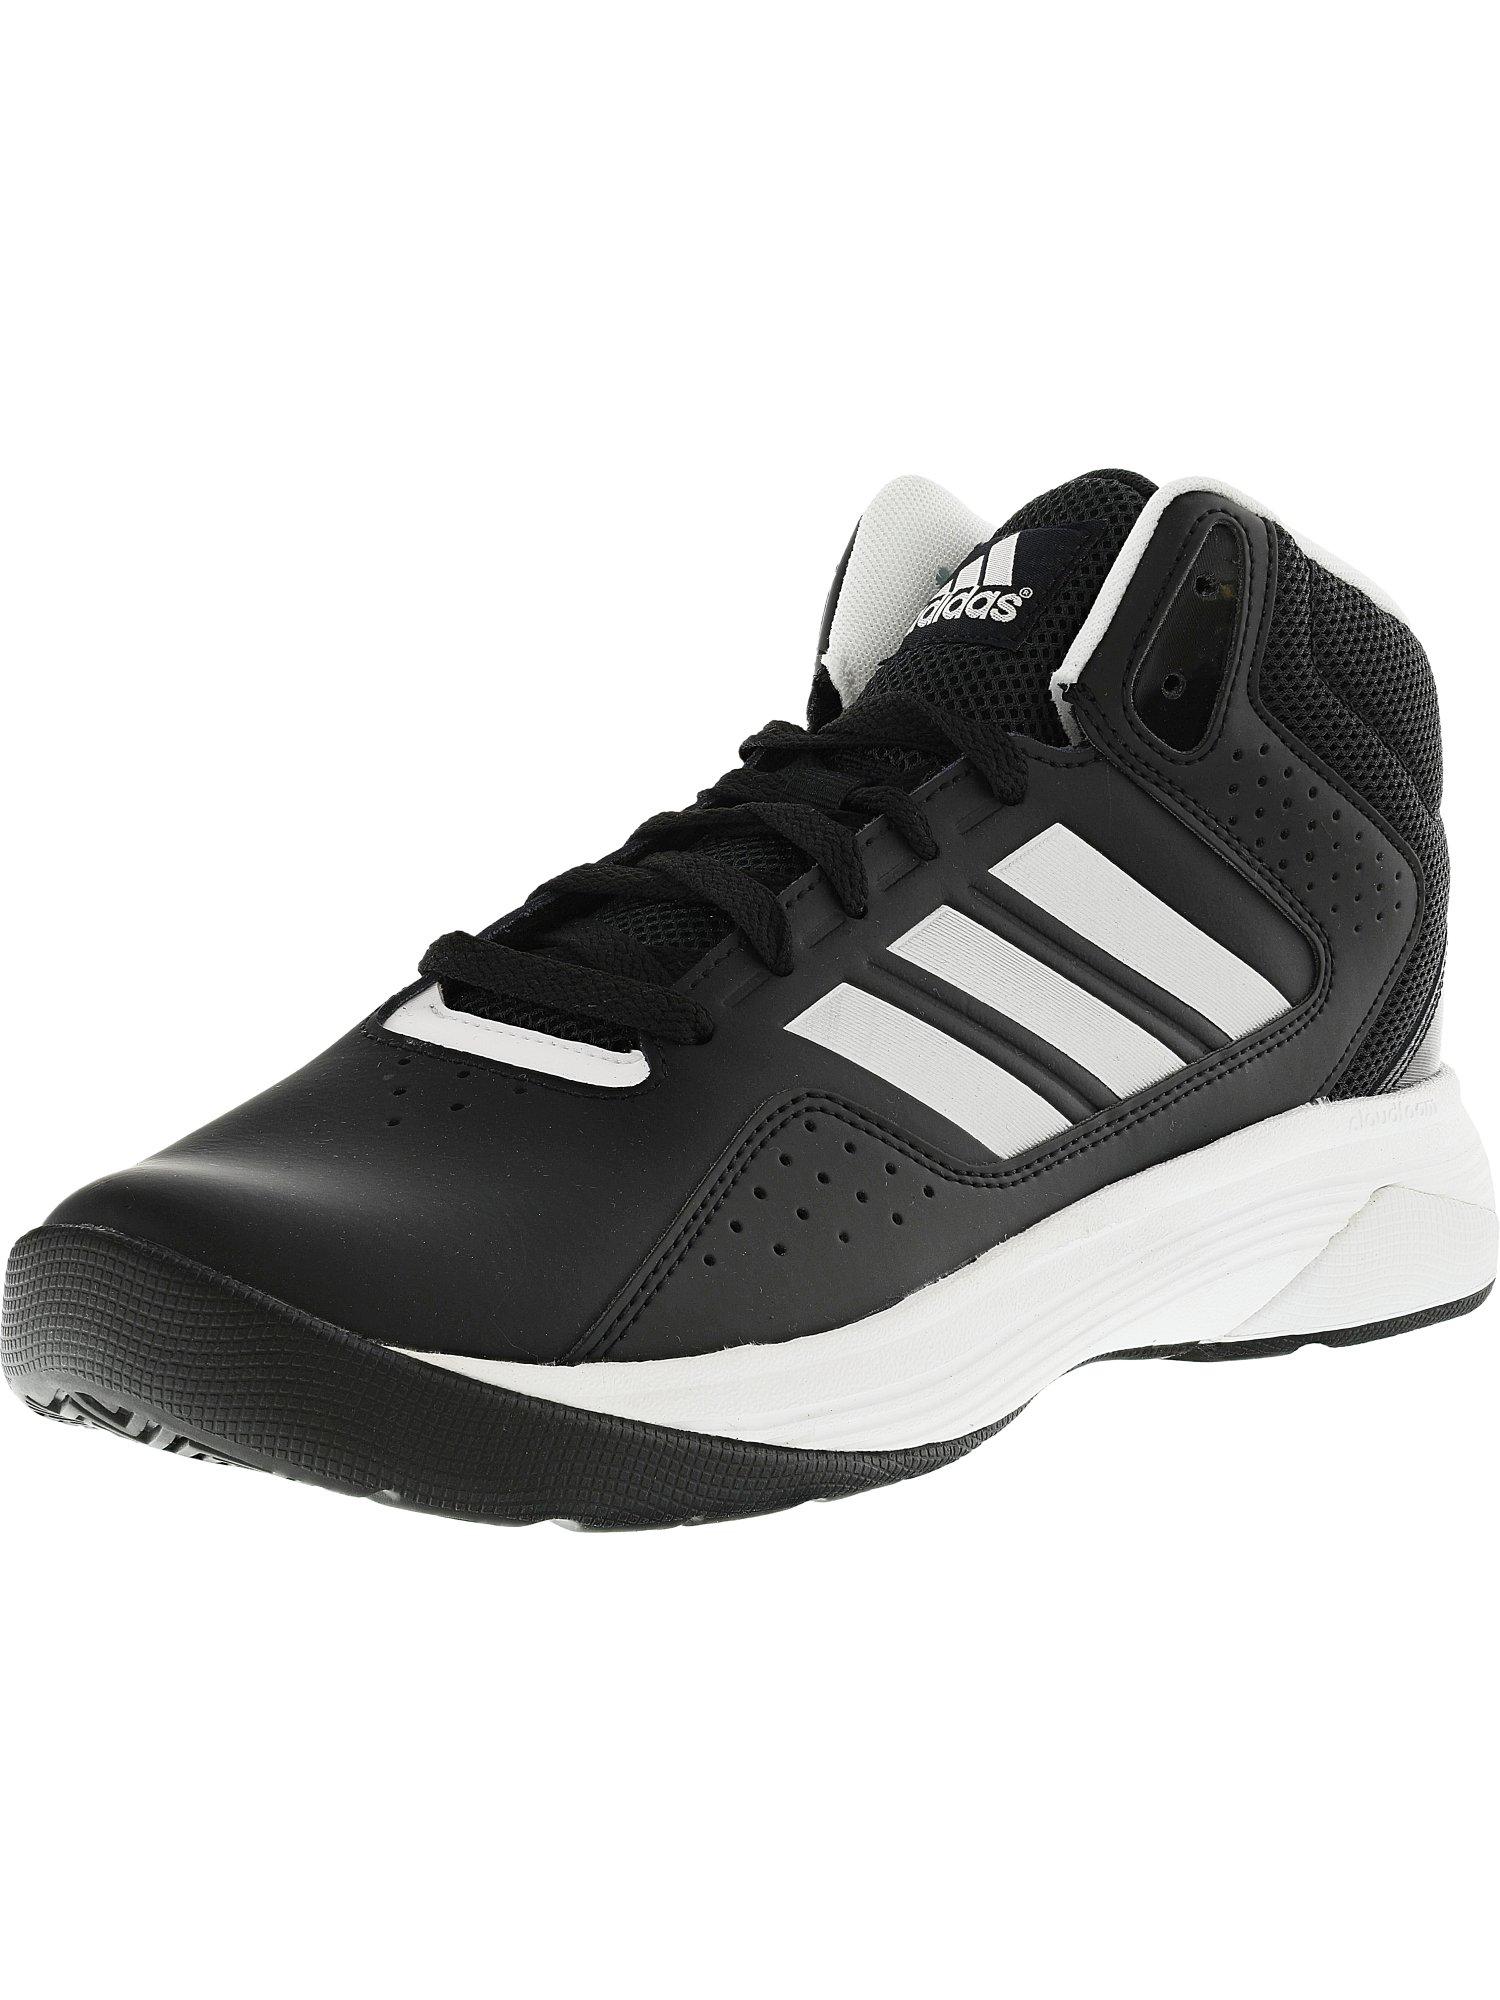 0e274a4d723a Adidas Men s Cloudfoam Ilation Mid High-Top Leather Basketball Shoe ...